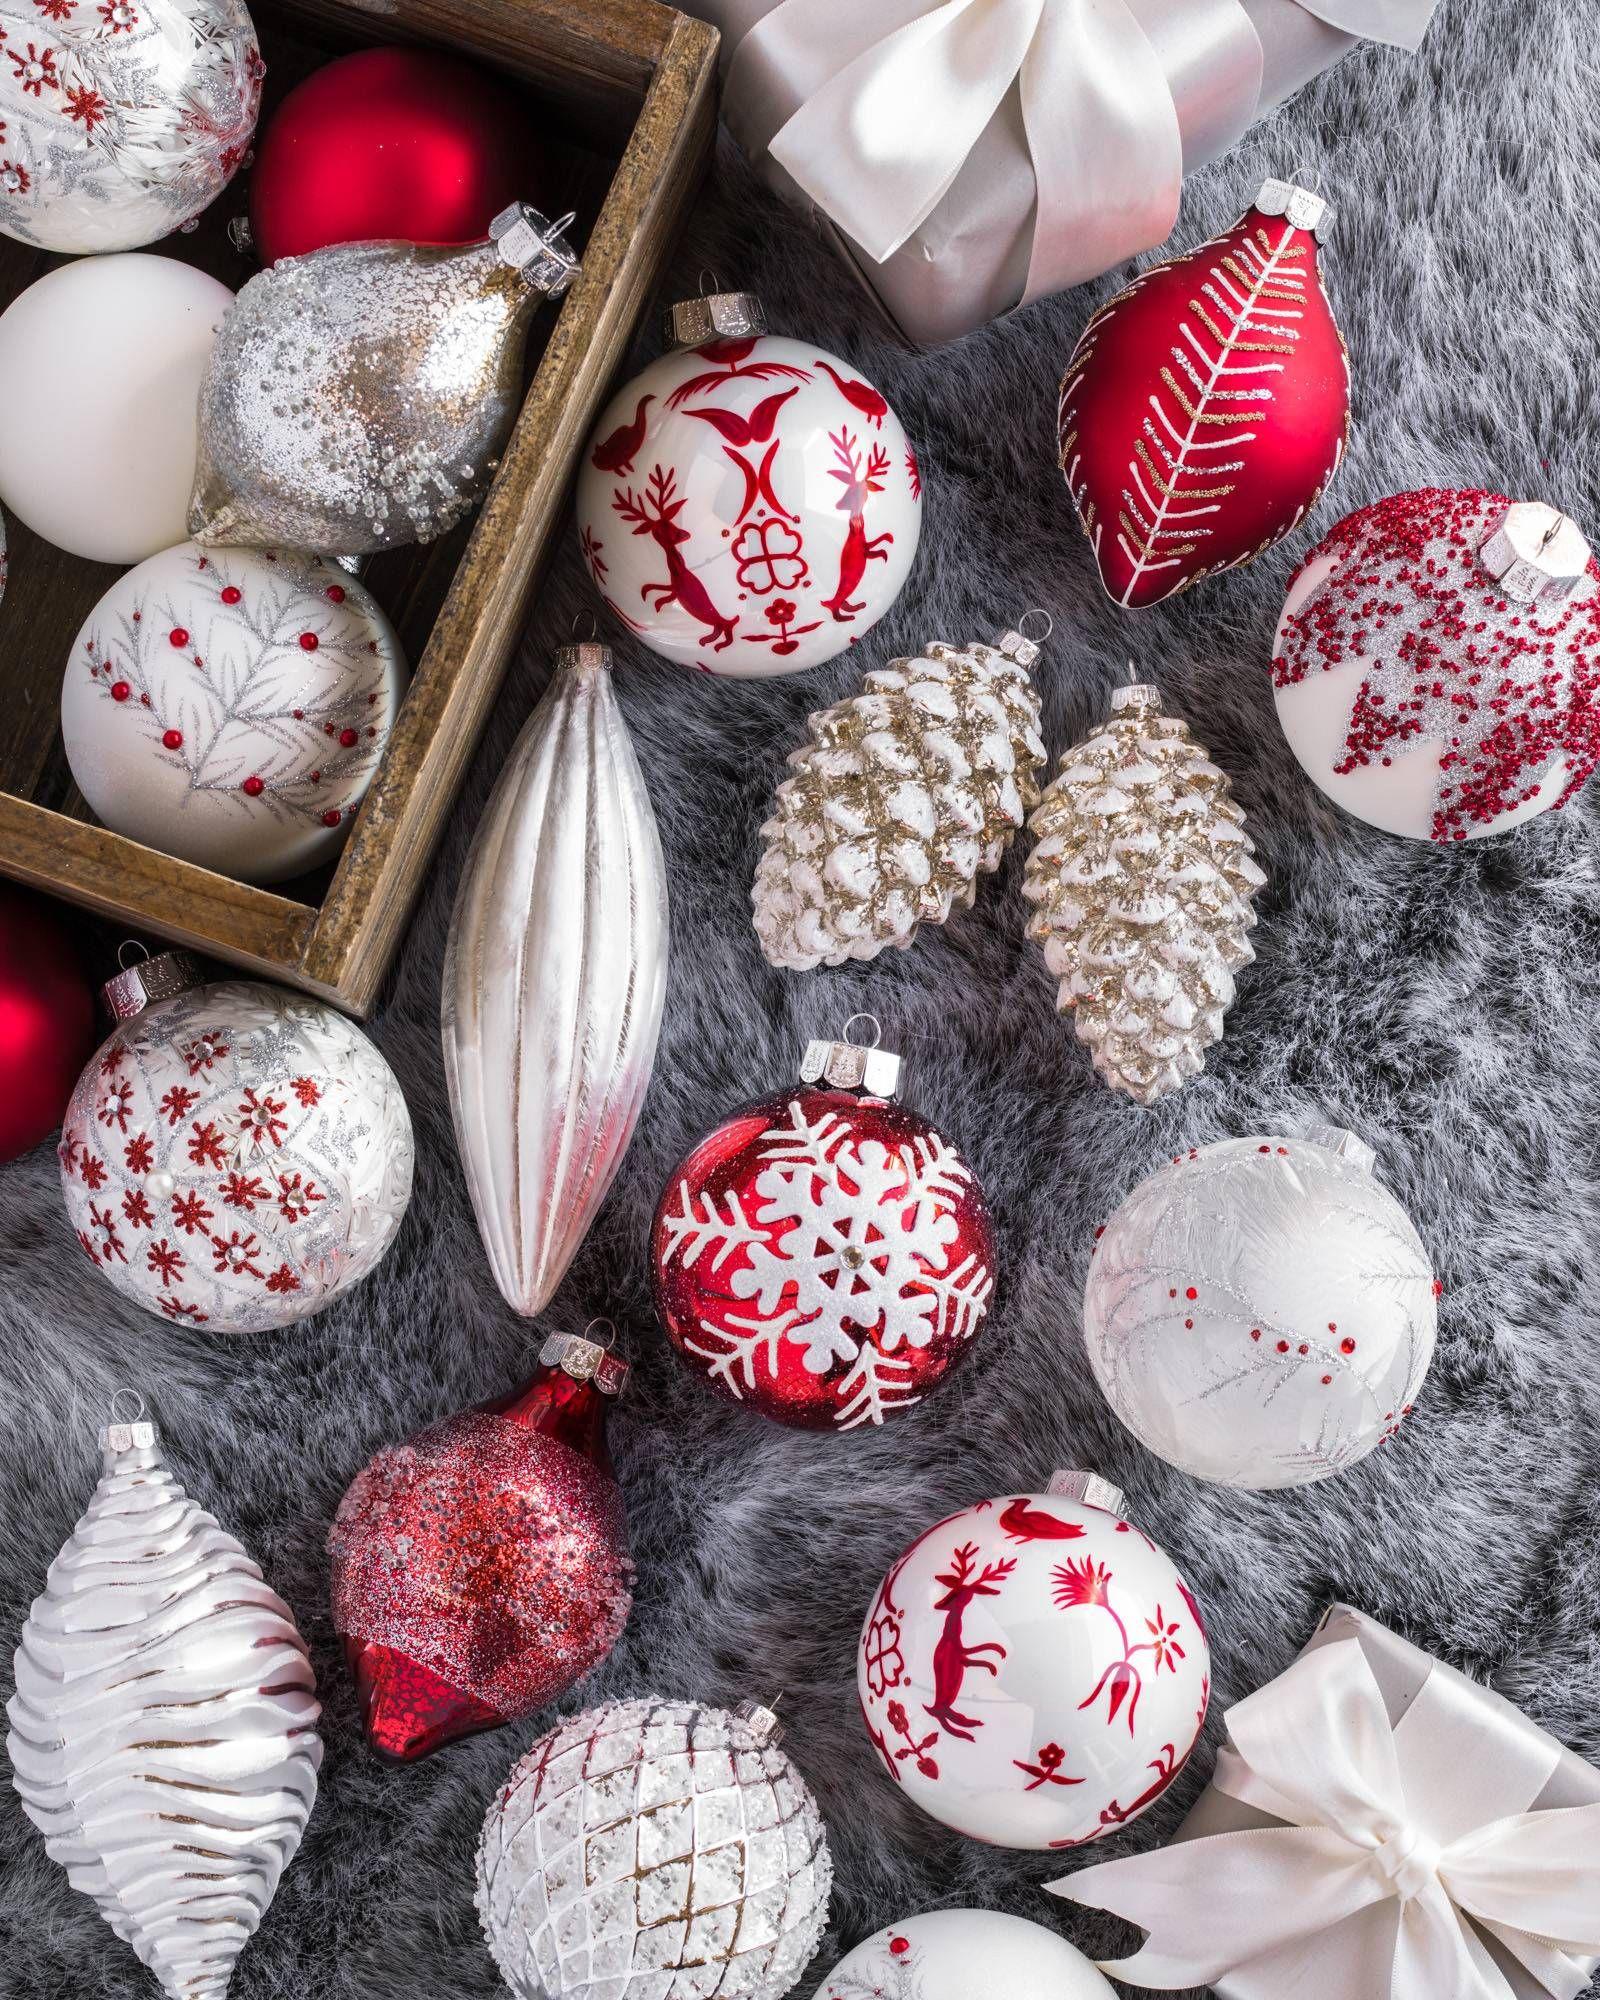 Nordic Frost Christmas Ornament Set Balsam Hill Ornament Set Christmas Themes Decorations Christmas Ornament Sets